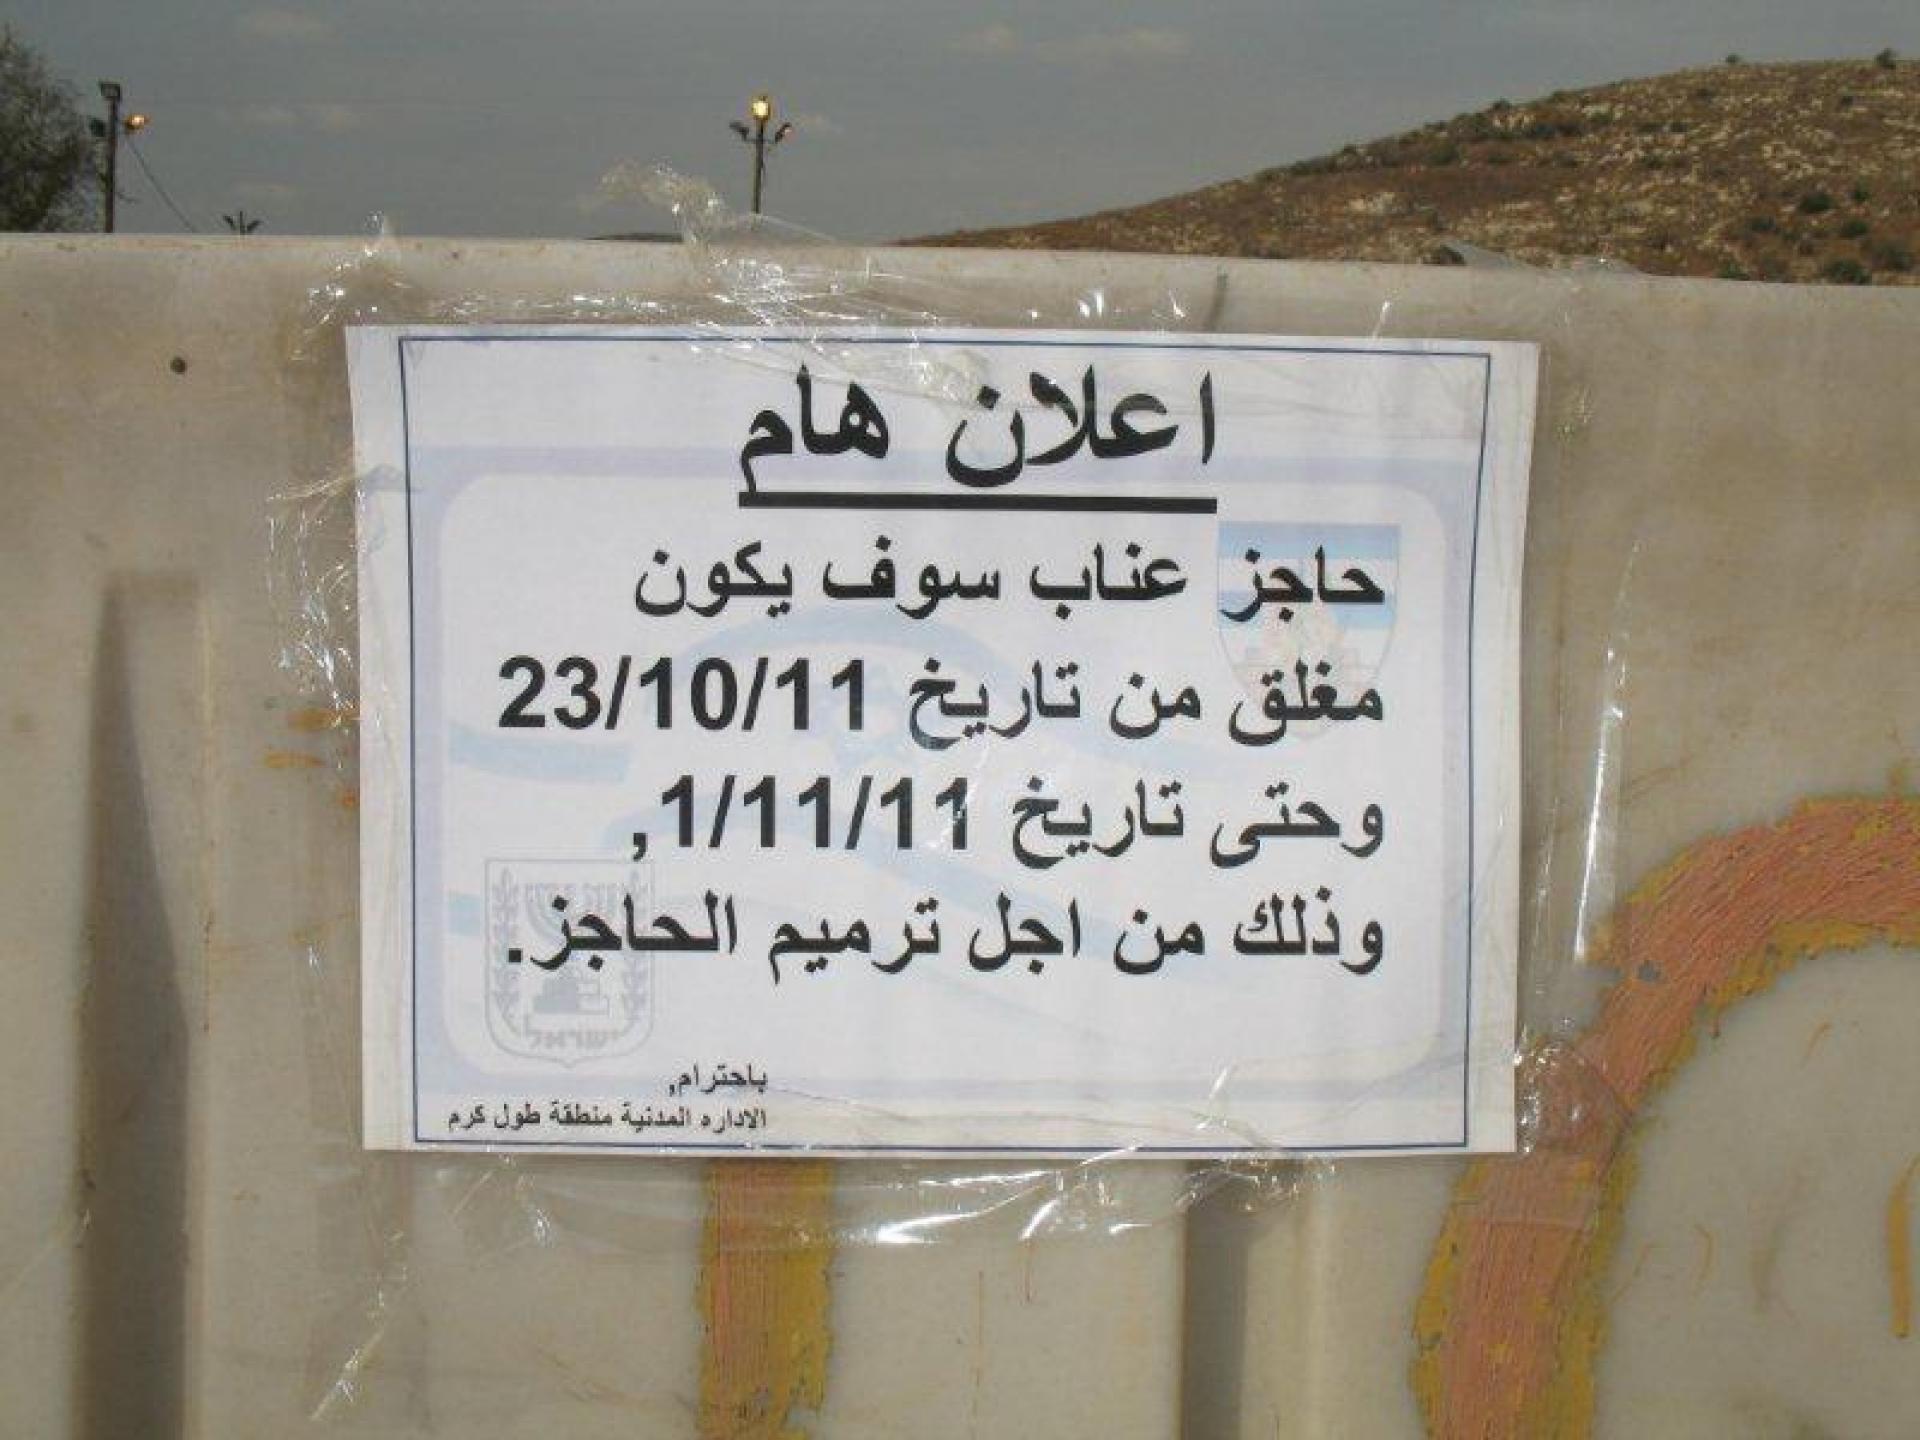 Anabta checkpoint 24.10.11